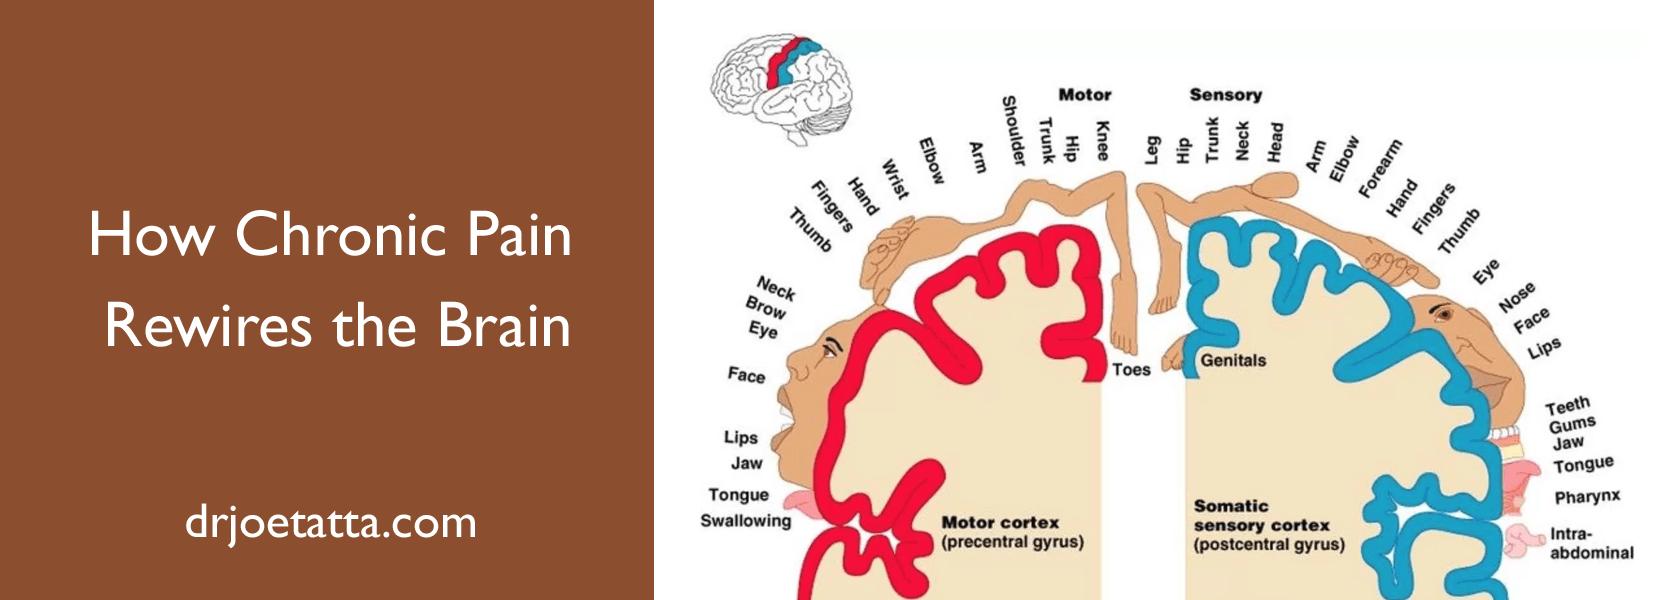 How Chronic Pain Rewires the Brain